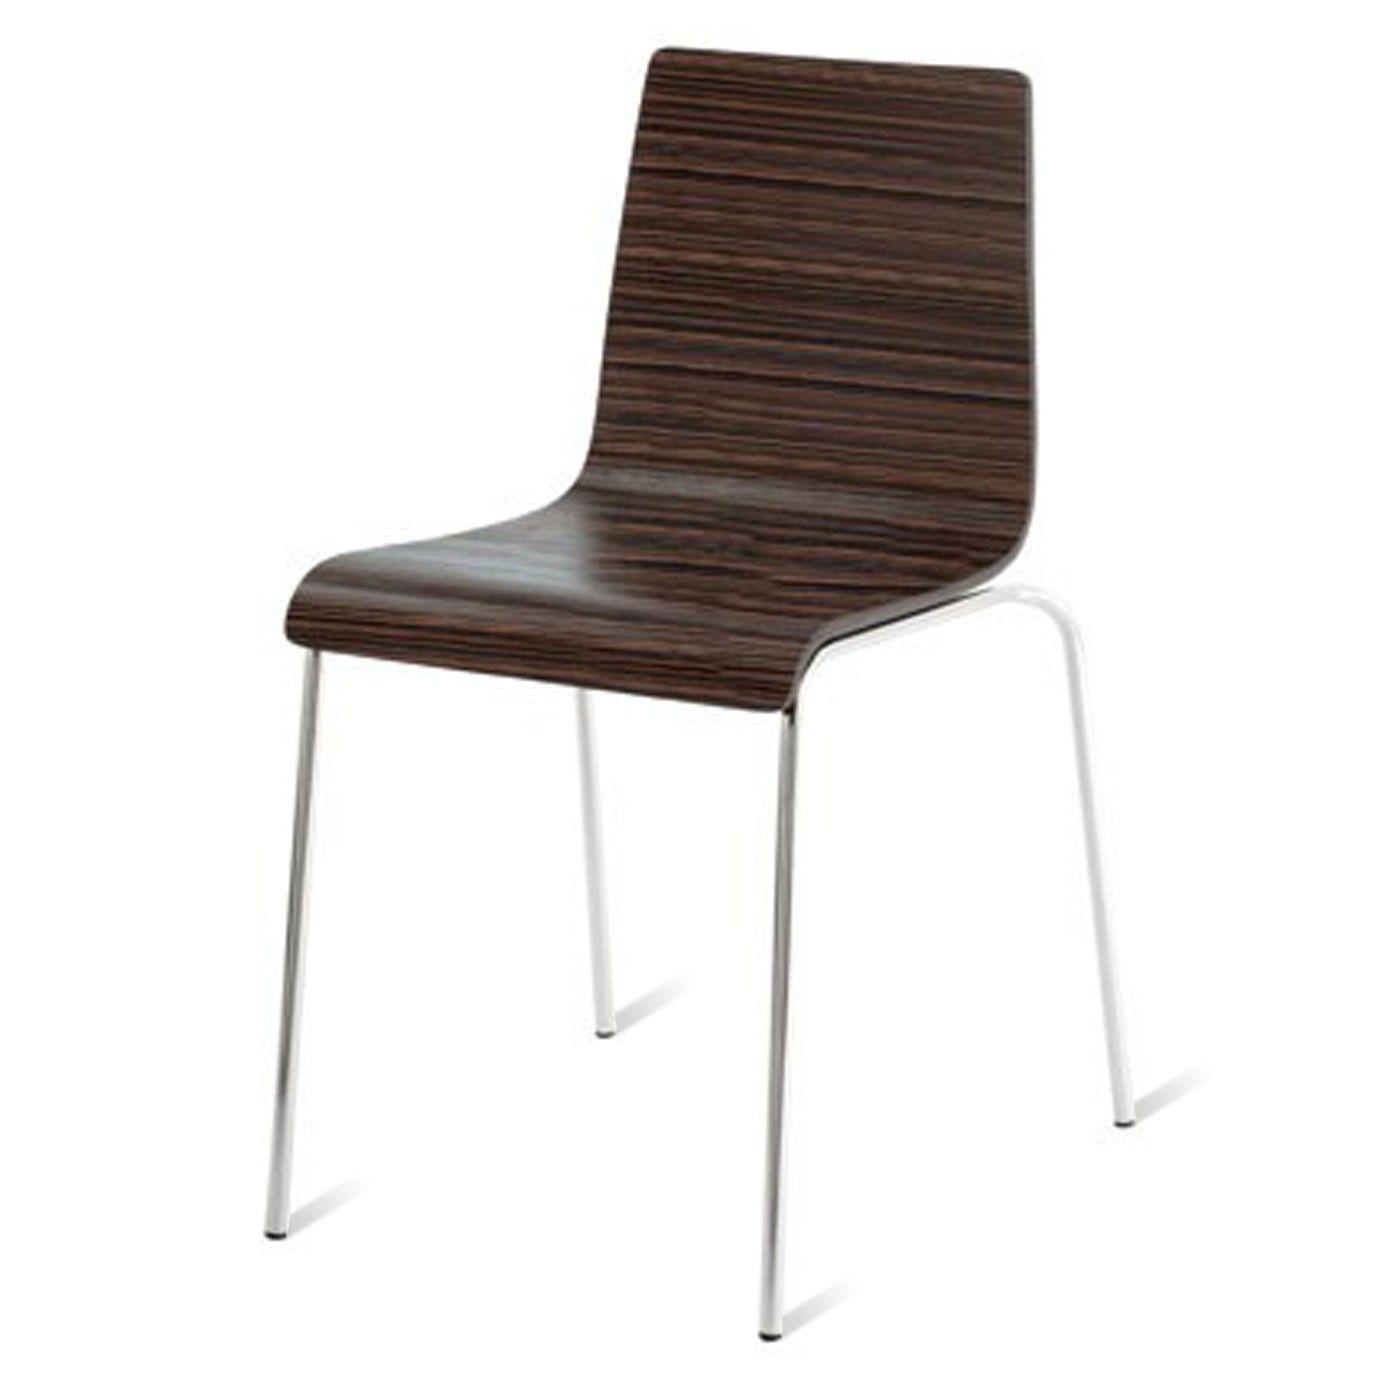 chairchairmodernchairebony1jpg 1400 1400 pixels – Wb Mason Chairs